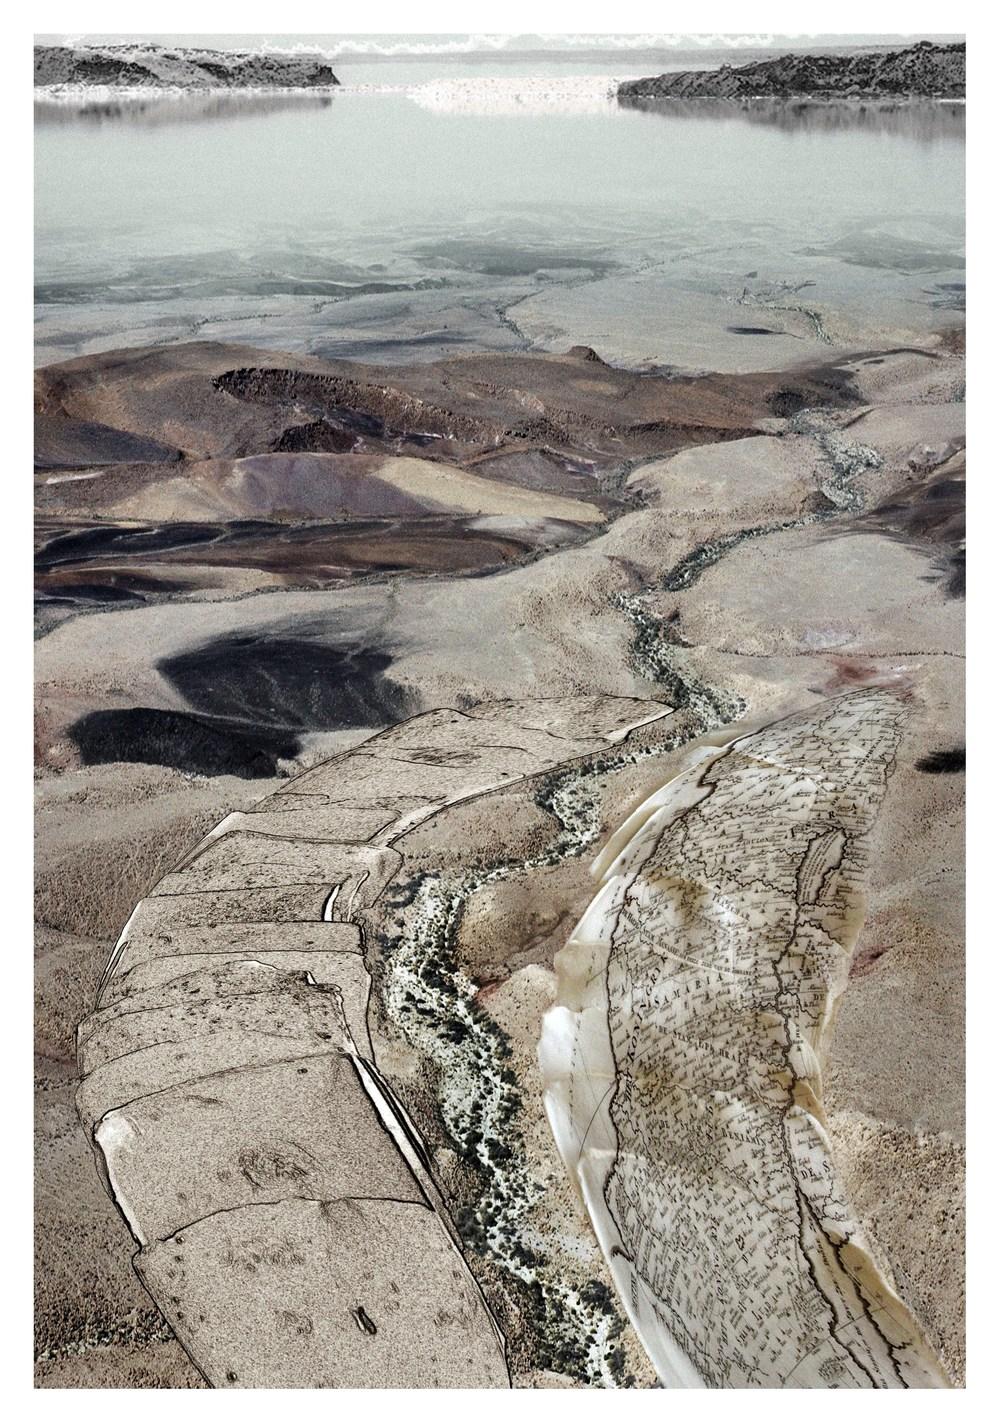 Dorit Feldman - Reflective Geophilosophy